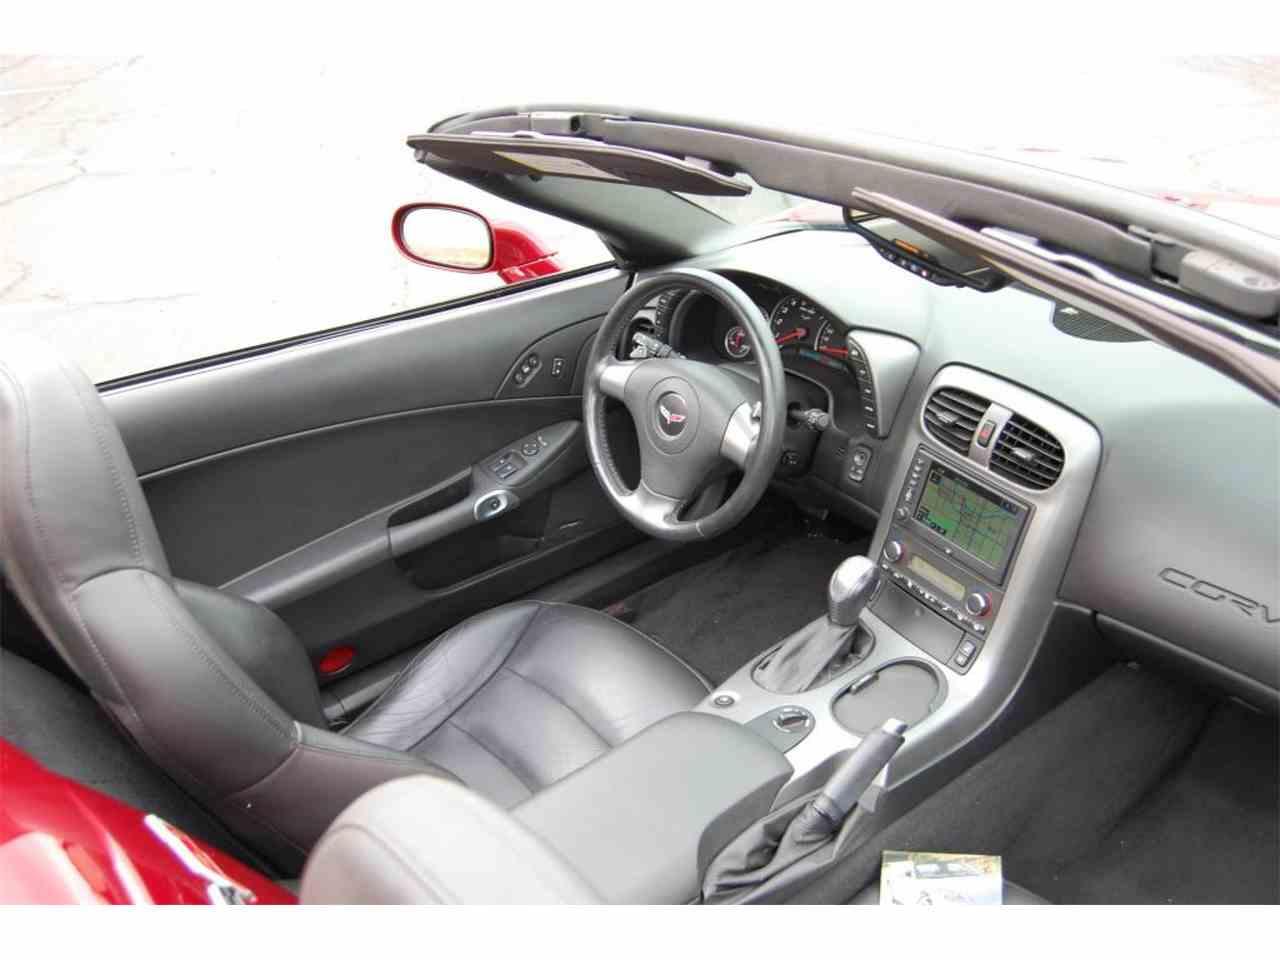 Large Picture of 2006 Corvette located in Arizona - $25,499.00 - L1ZB